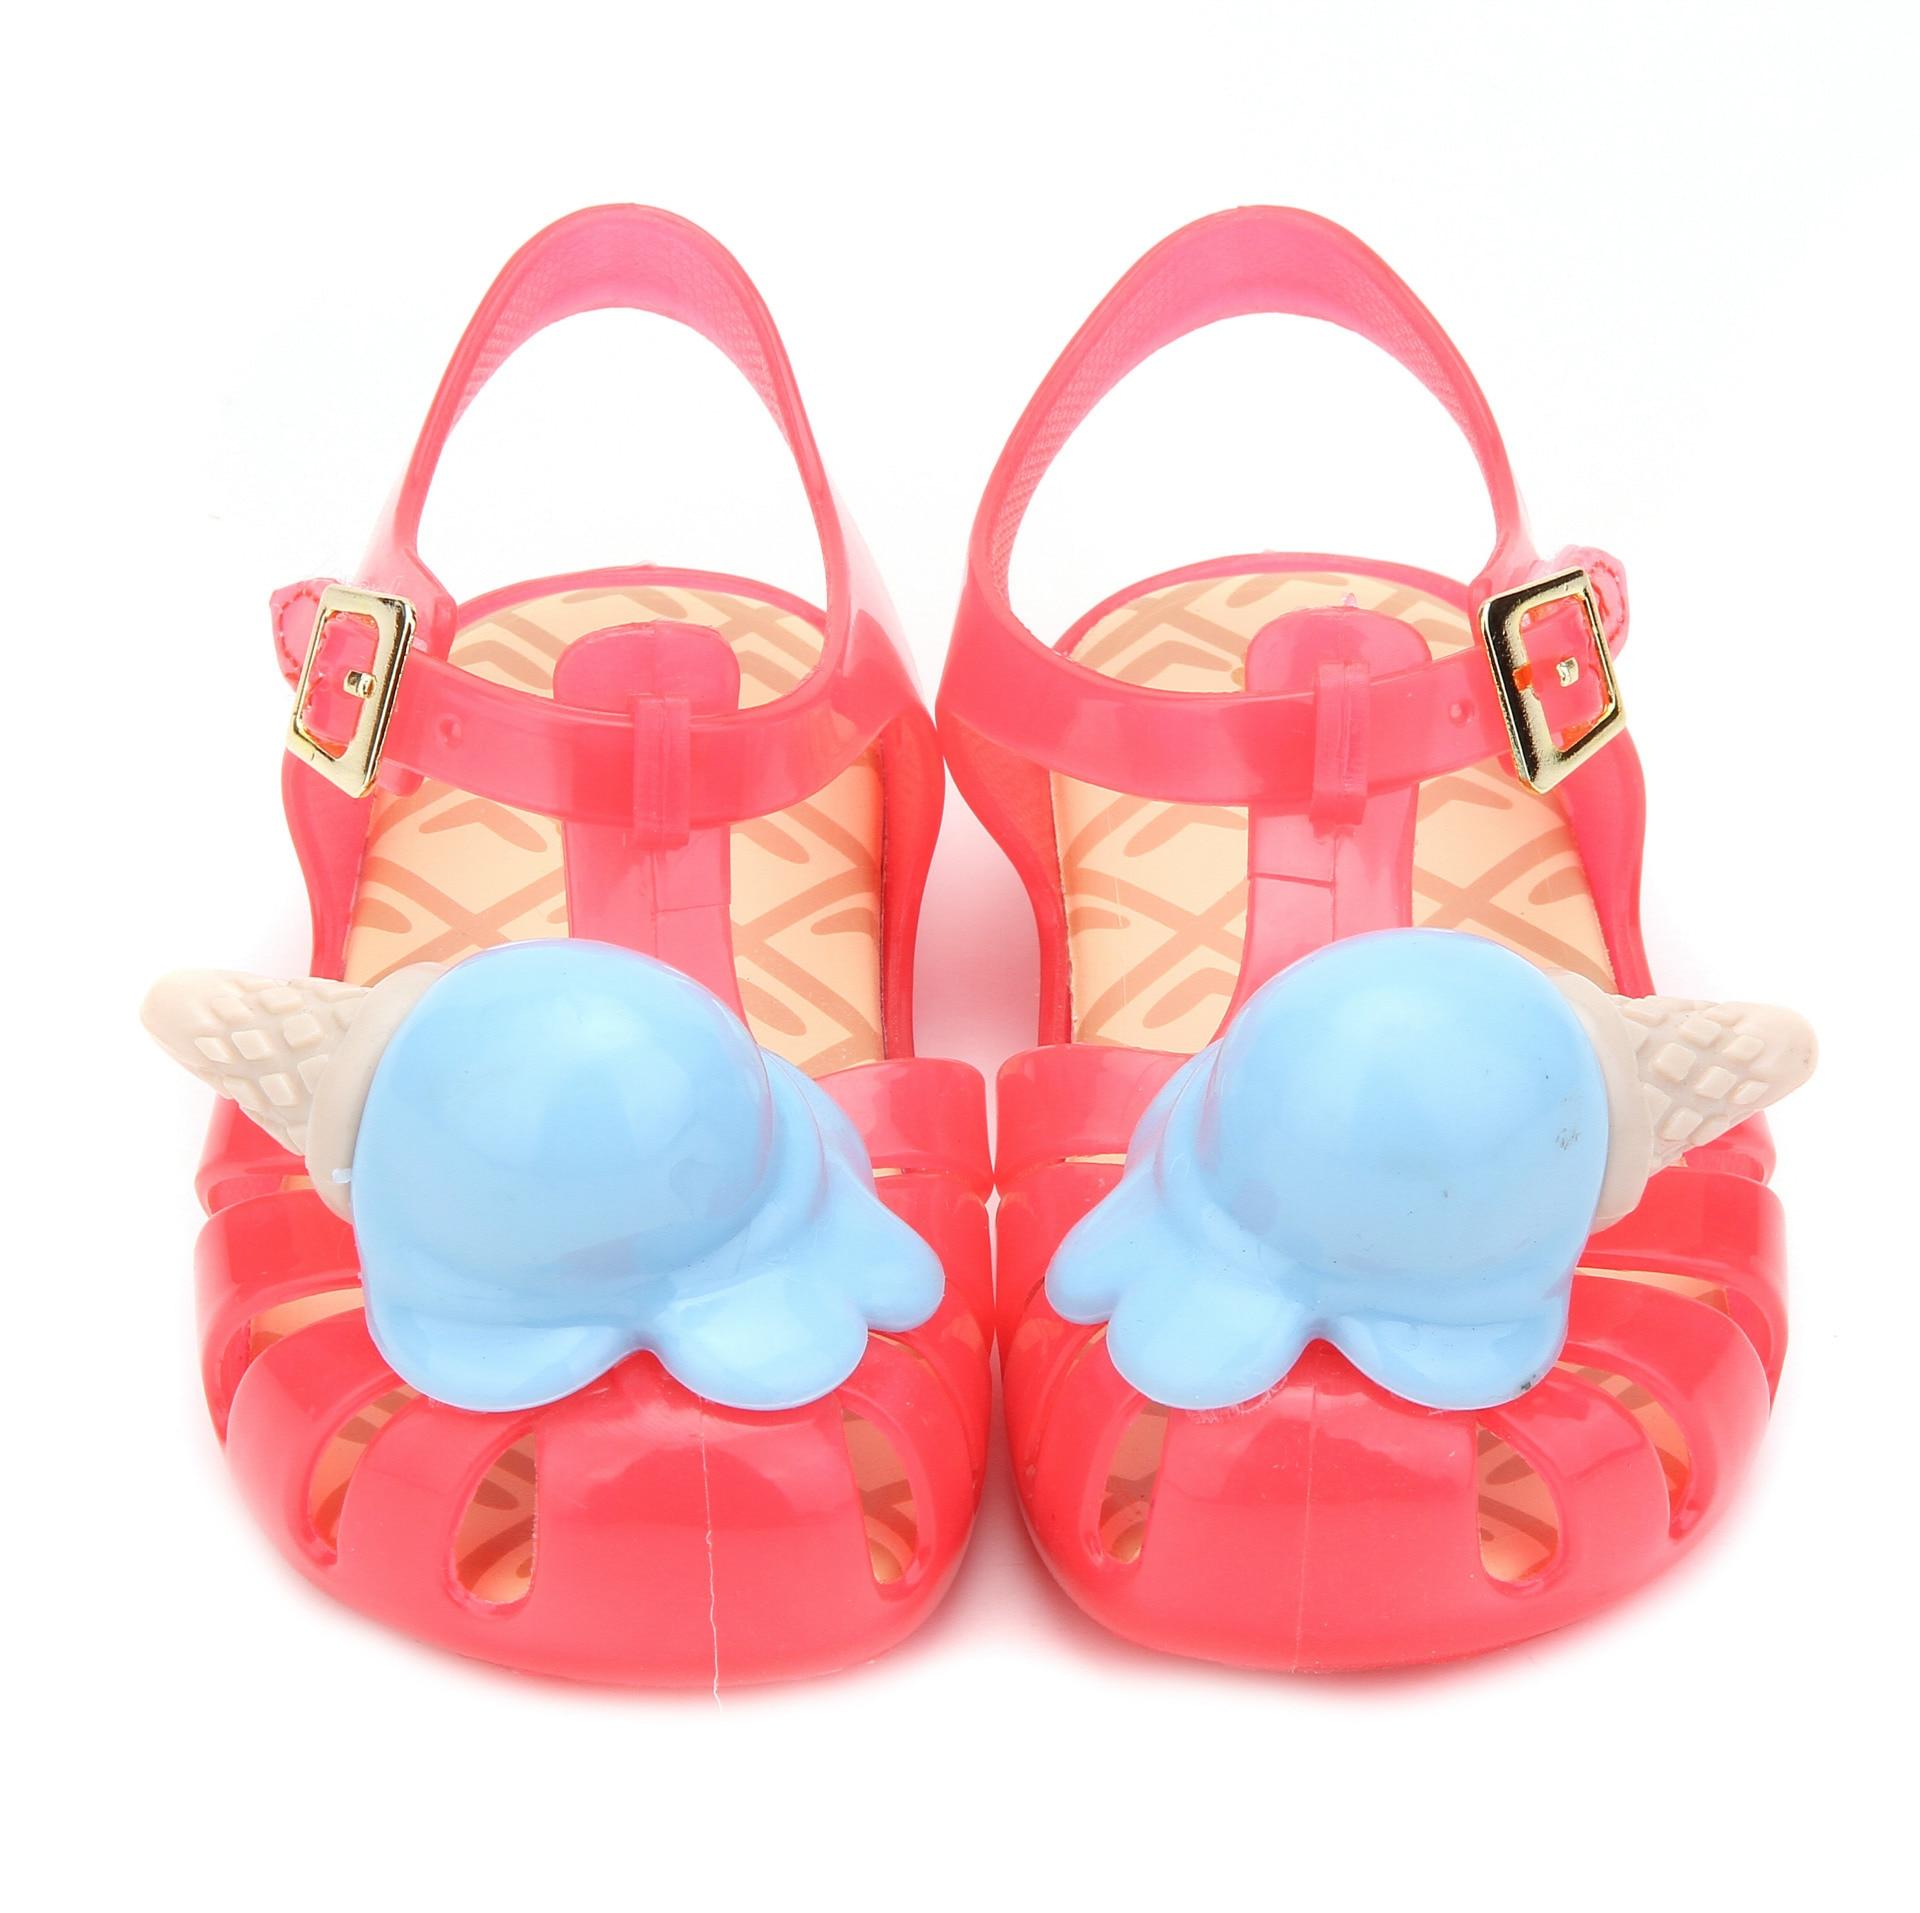 Girl's Jelly Shoes Summer Fashion Kids Roma Sandals Ice Cream Princess PVC Shoes Beach Wear Min Melissa Summer Sandals SH108